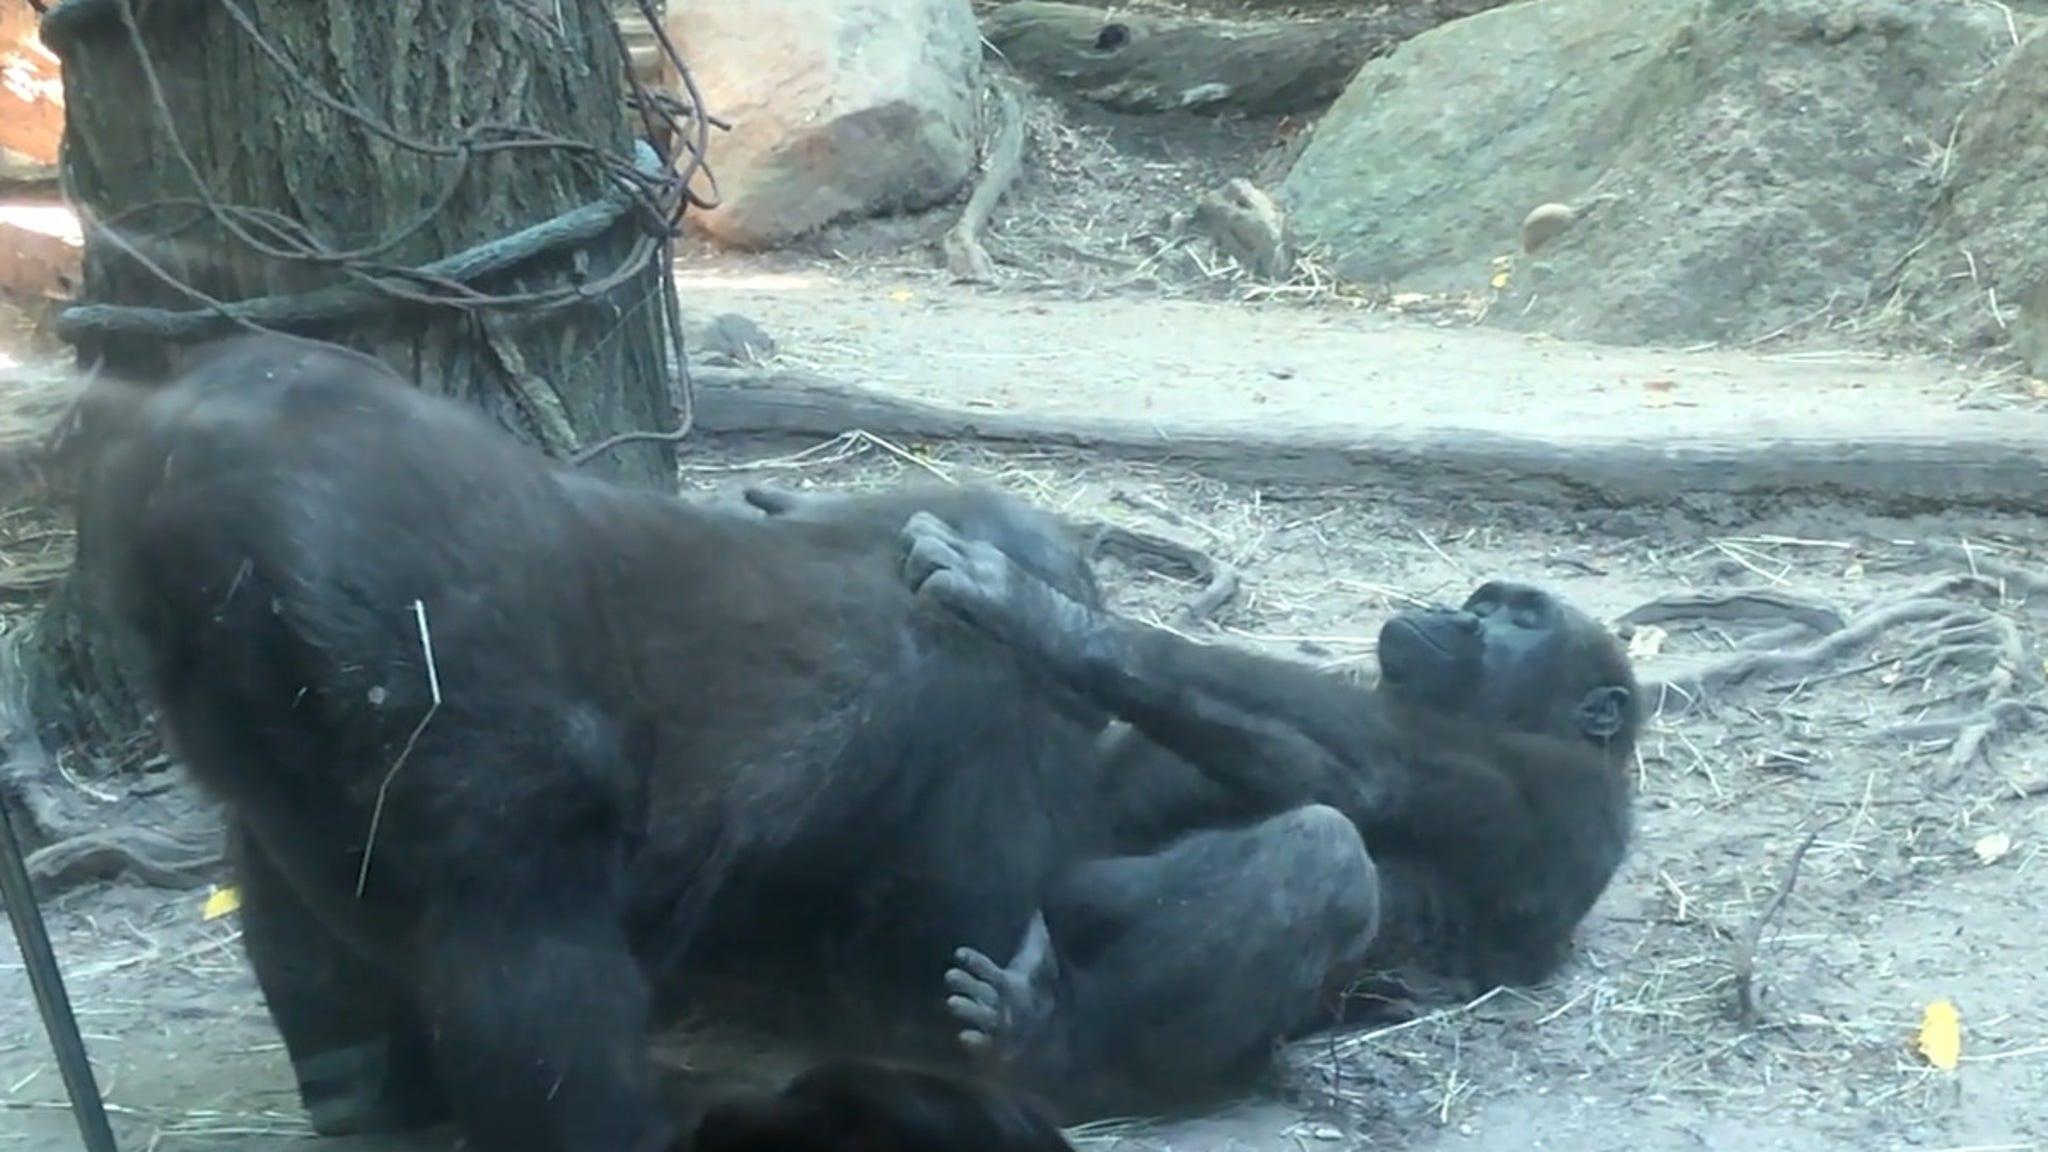 Gorillas Perform Oral Sex at Bronx Zoo, Humans Horrified